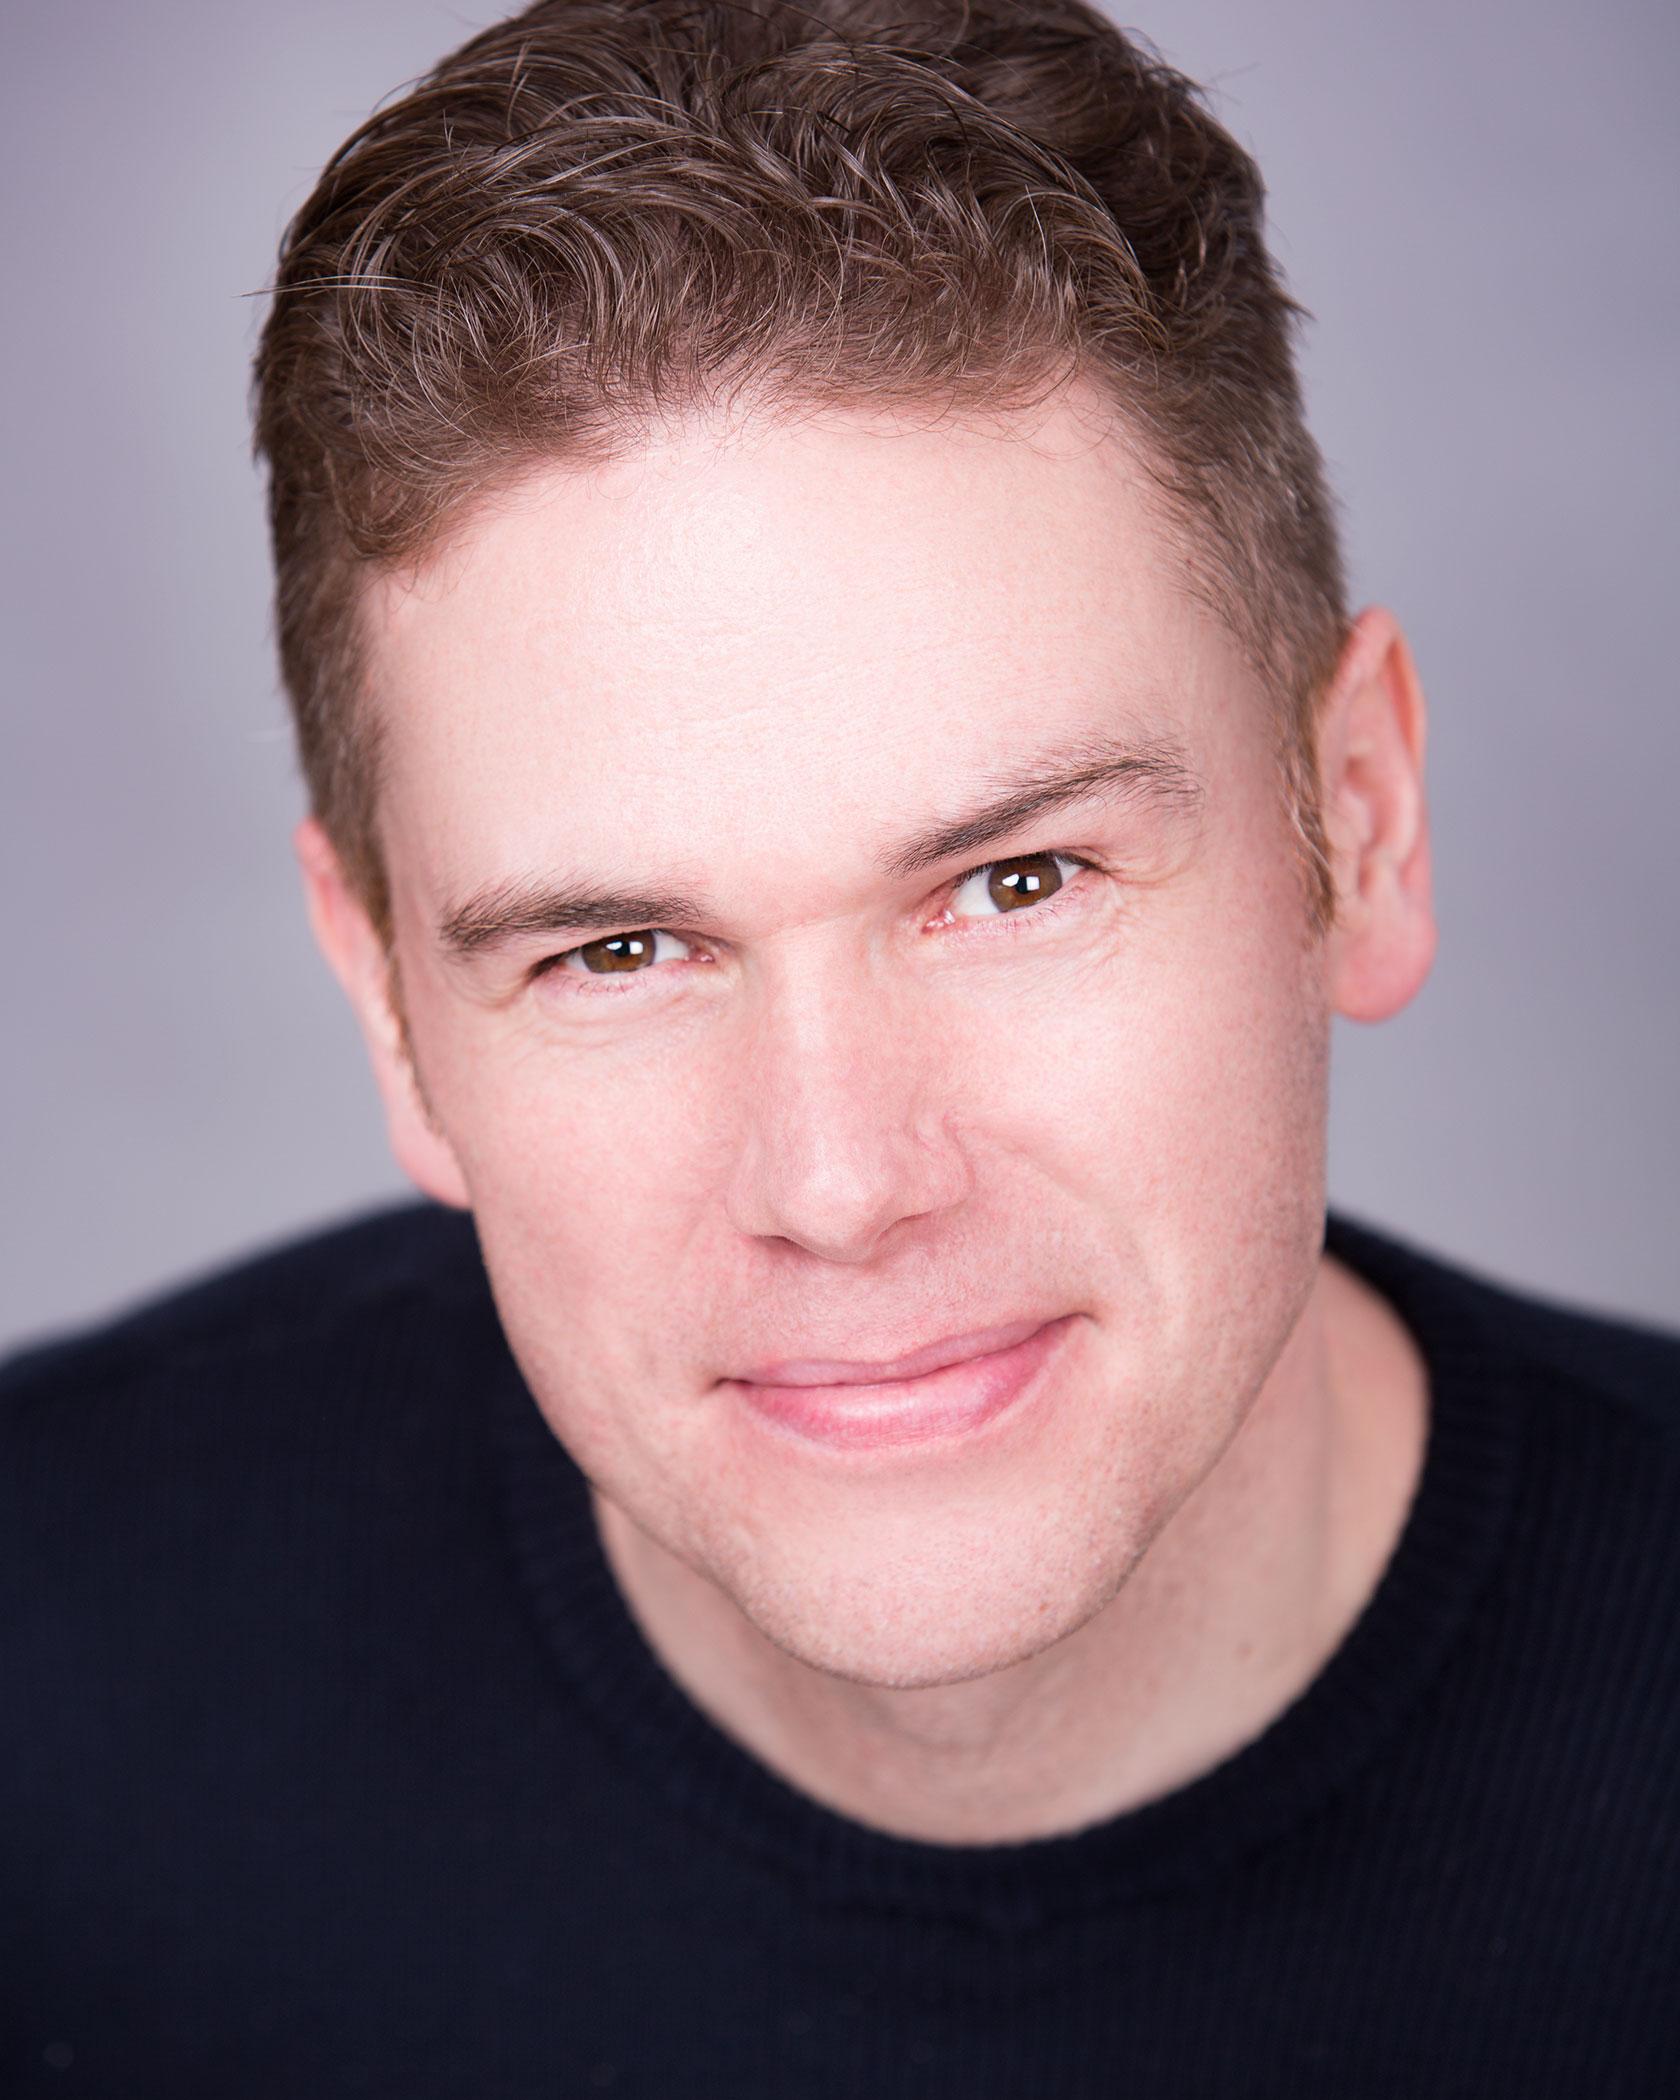 Shaun Dalton | Actors Headshot